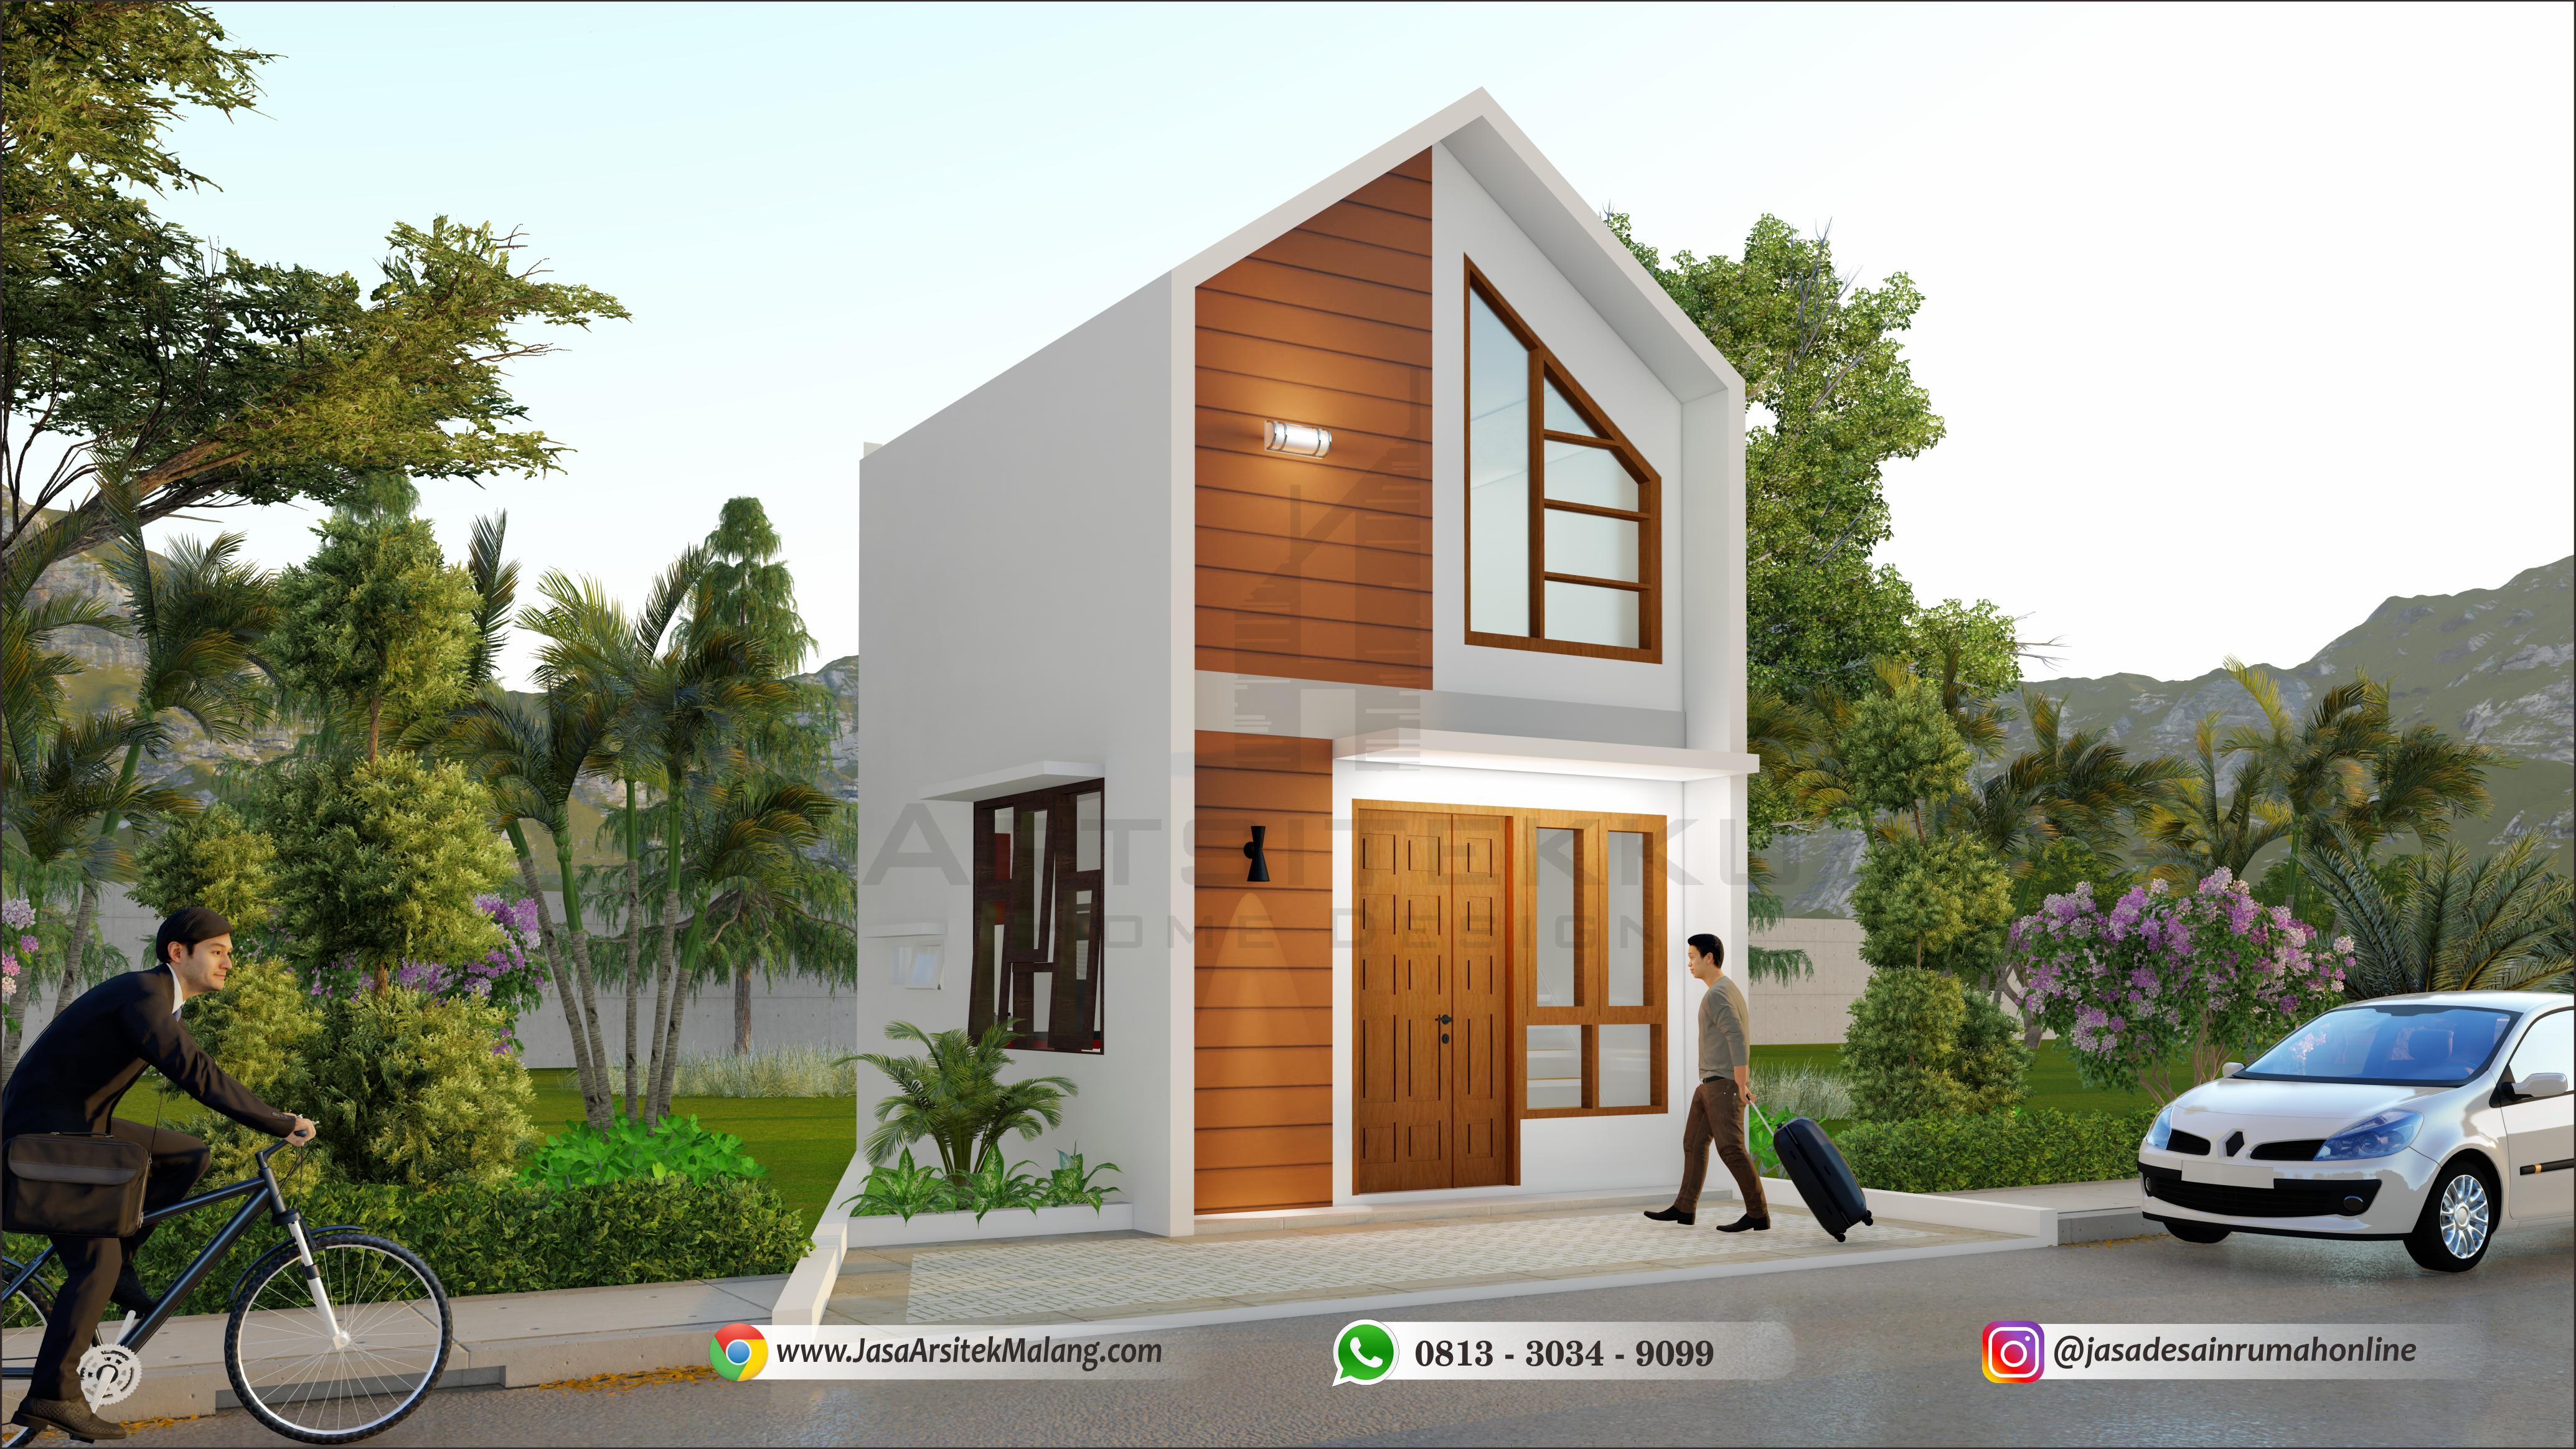 Call Wa 0813 3034 9099 Nayla Jasa Arsitek Desain Rumah Malang In 2020 Outdoor Decor Home Home Decor